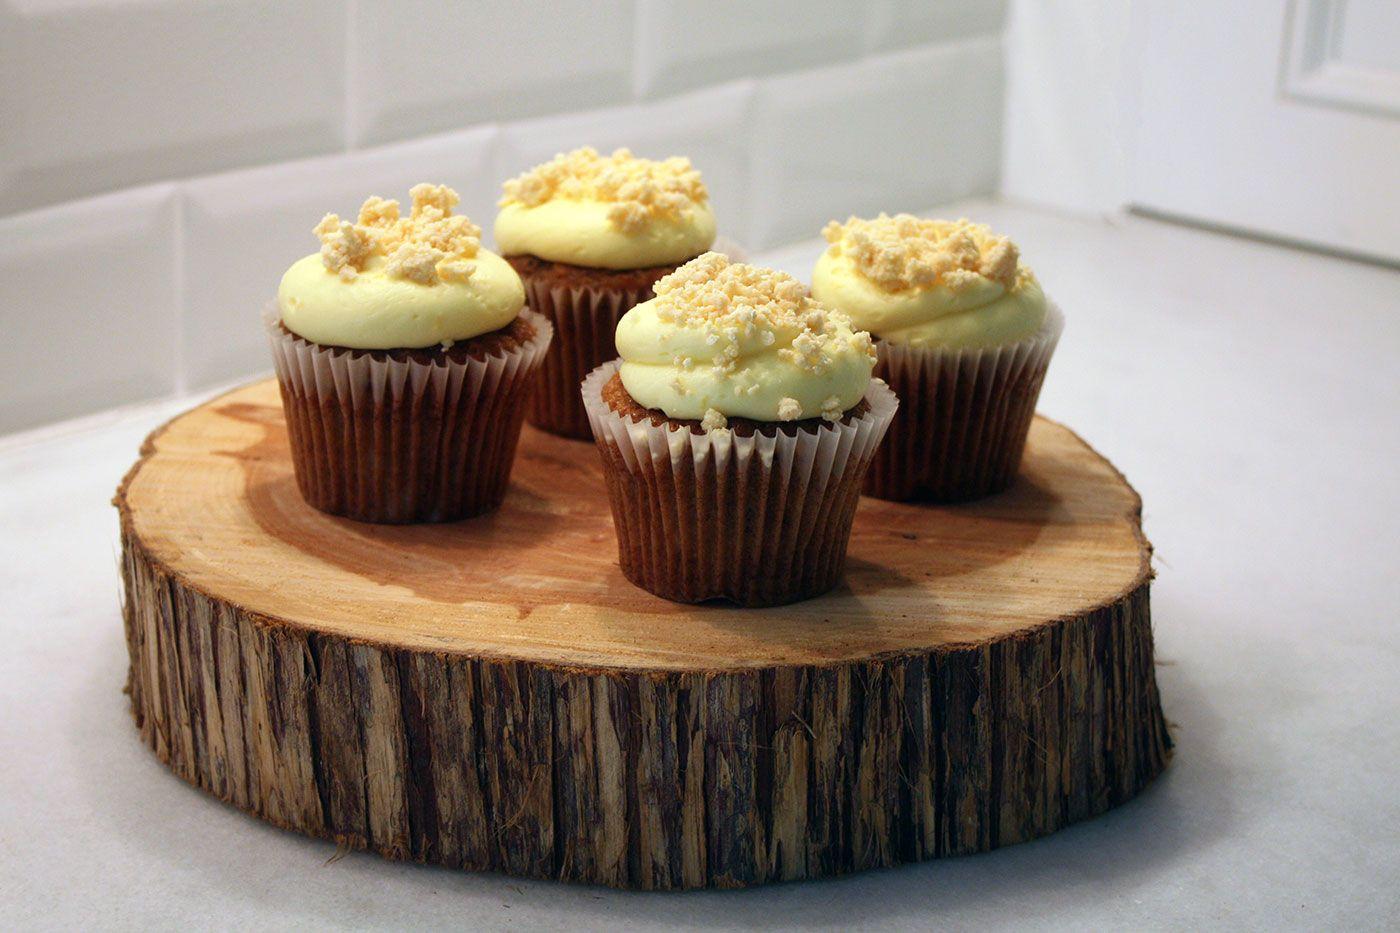 Hummingbird Cupcakes with Lemon Cream Cheese Frosting